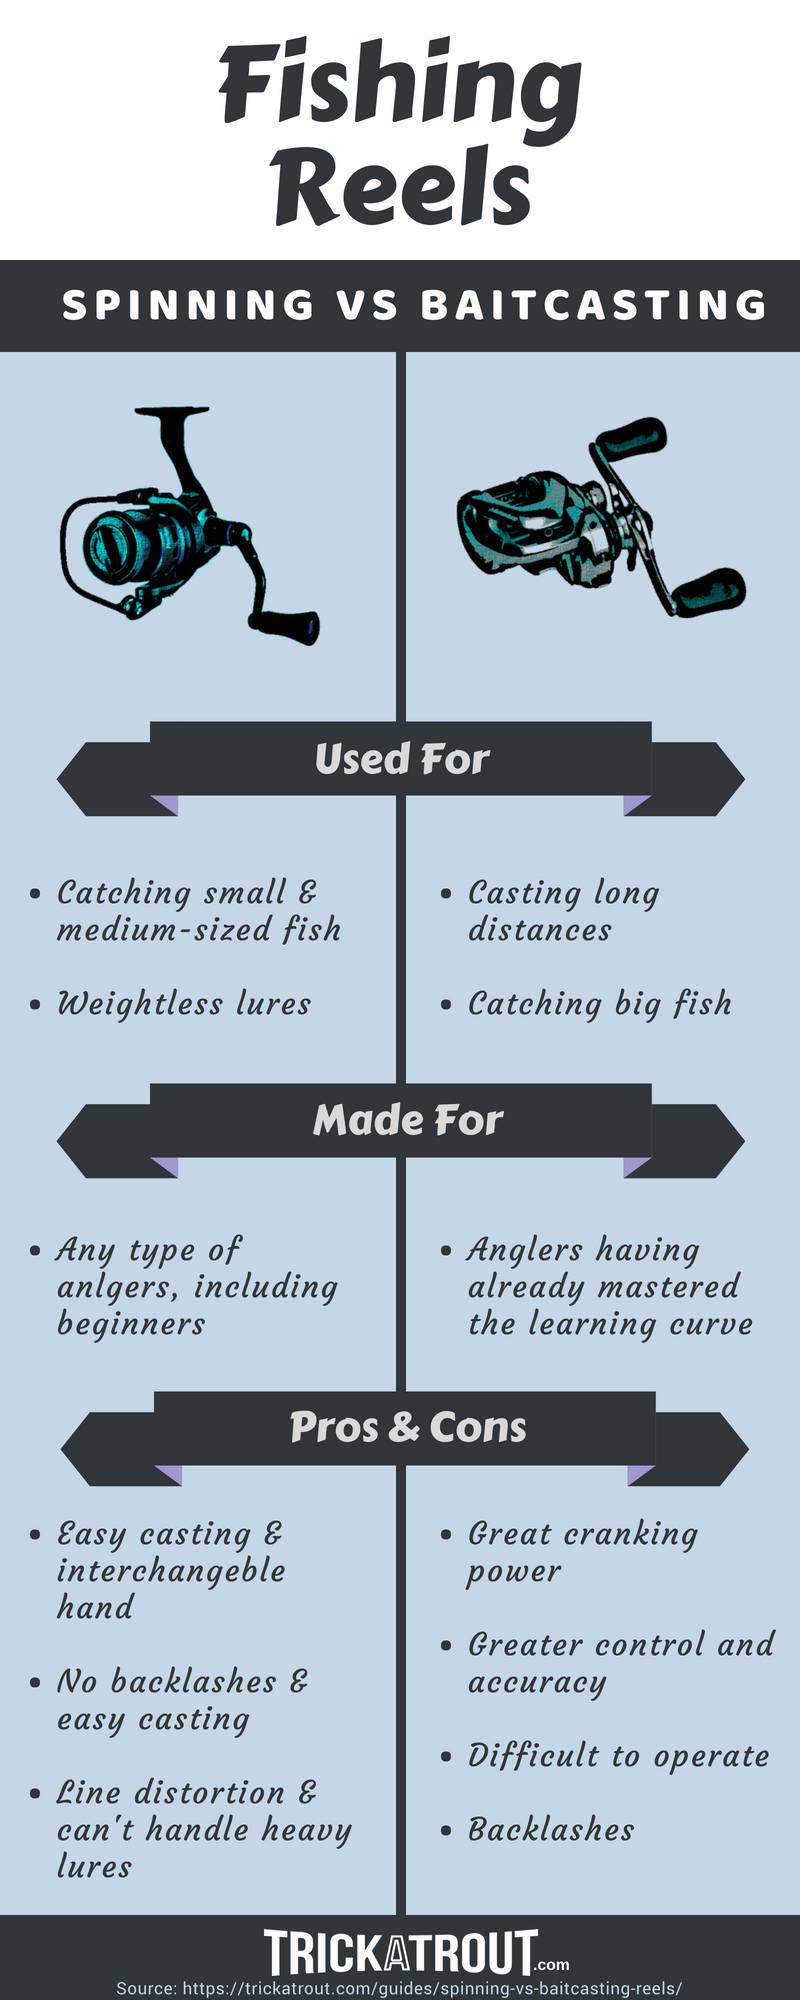 Spinning vs Baitcasting Reels Infographic